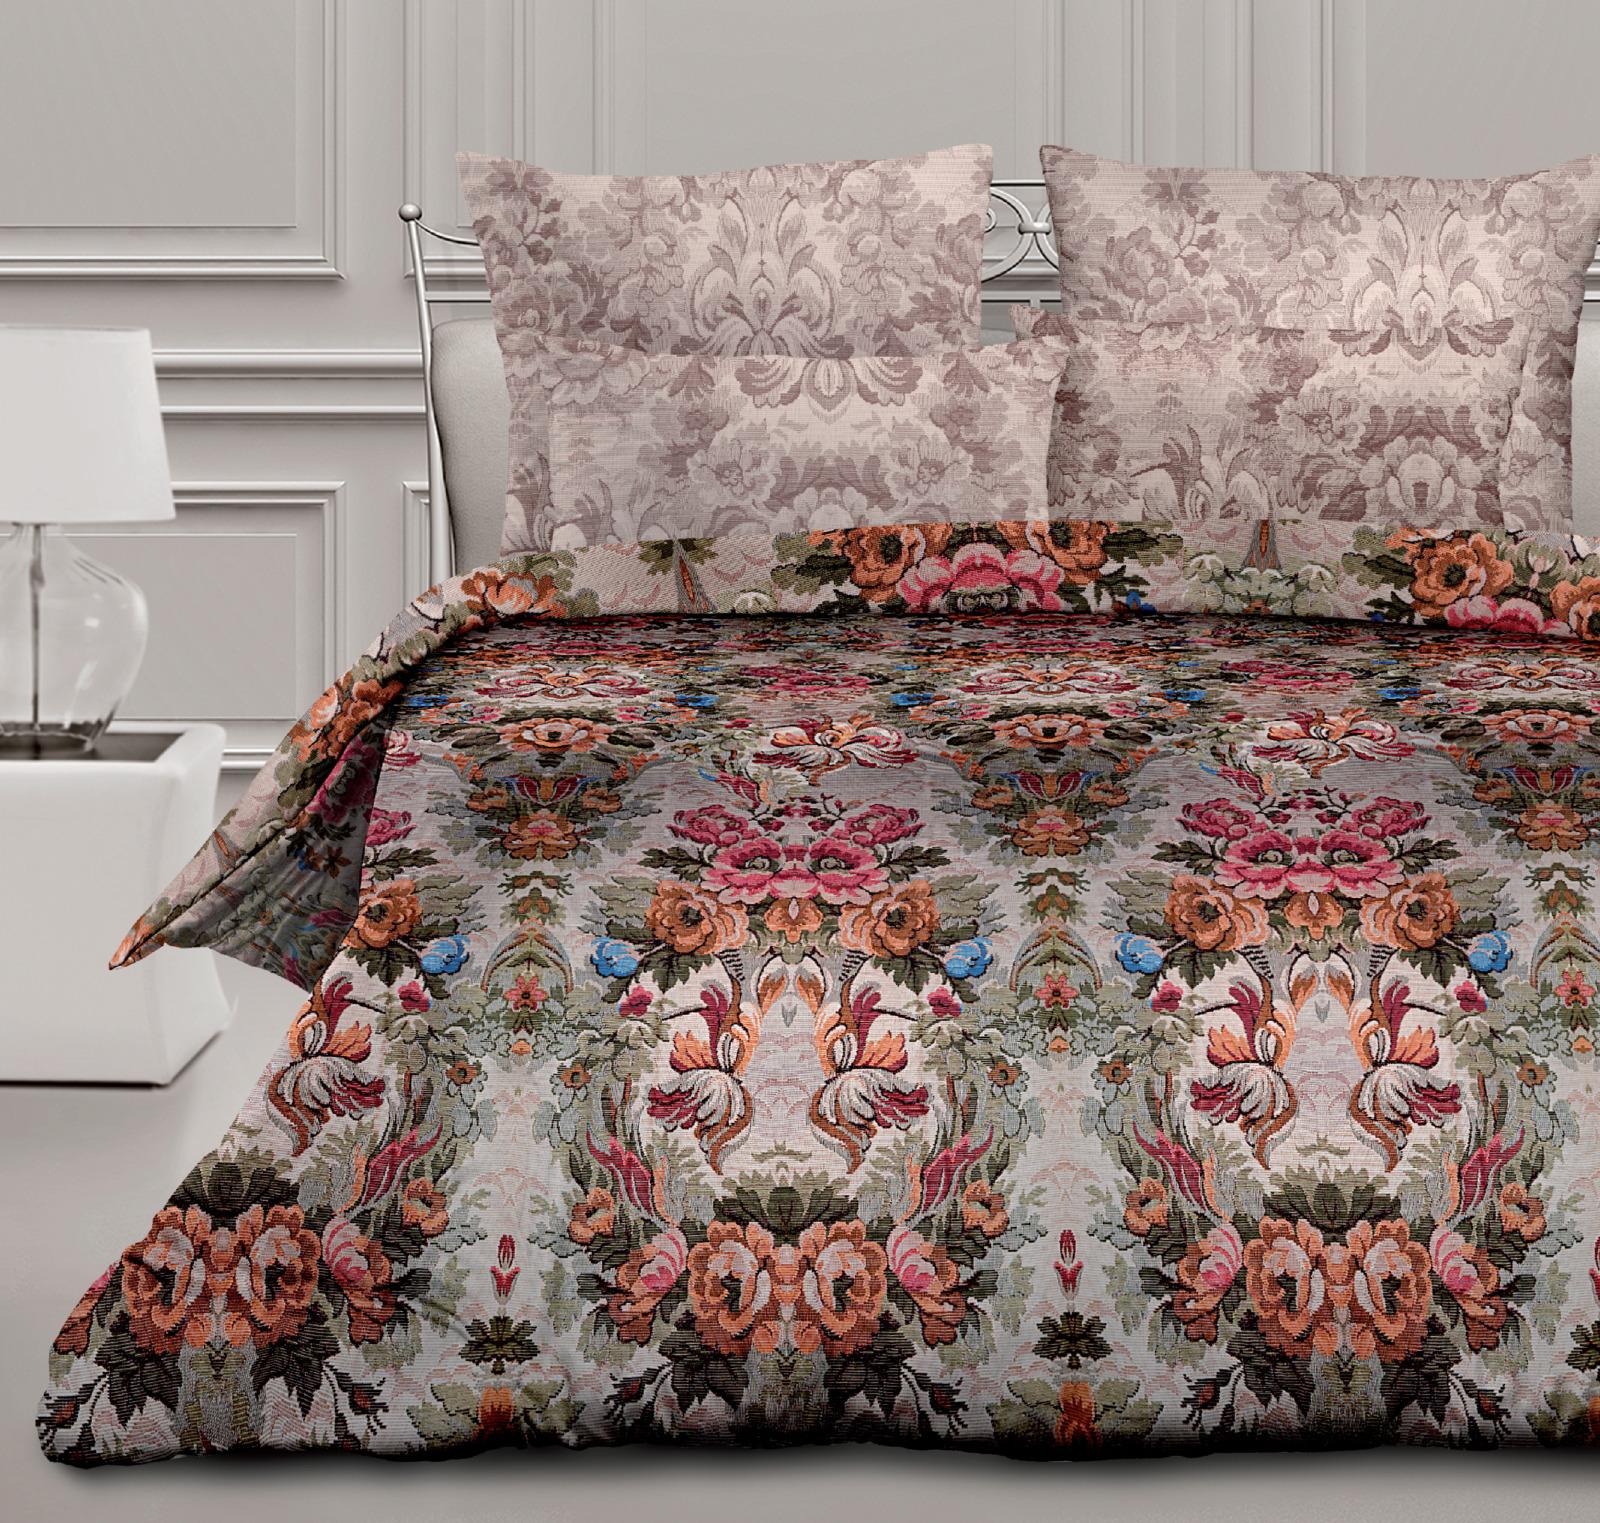 Комплект белья Унисон Мон Плезир, 490539, 1,5 спальный, наволочки 70х70 цена